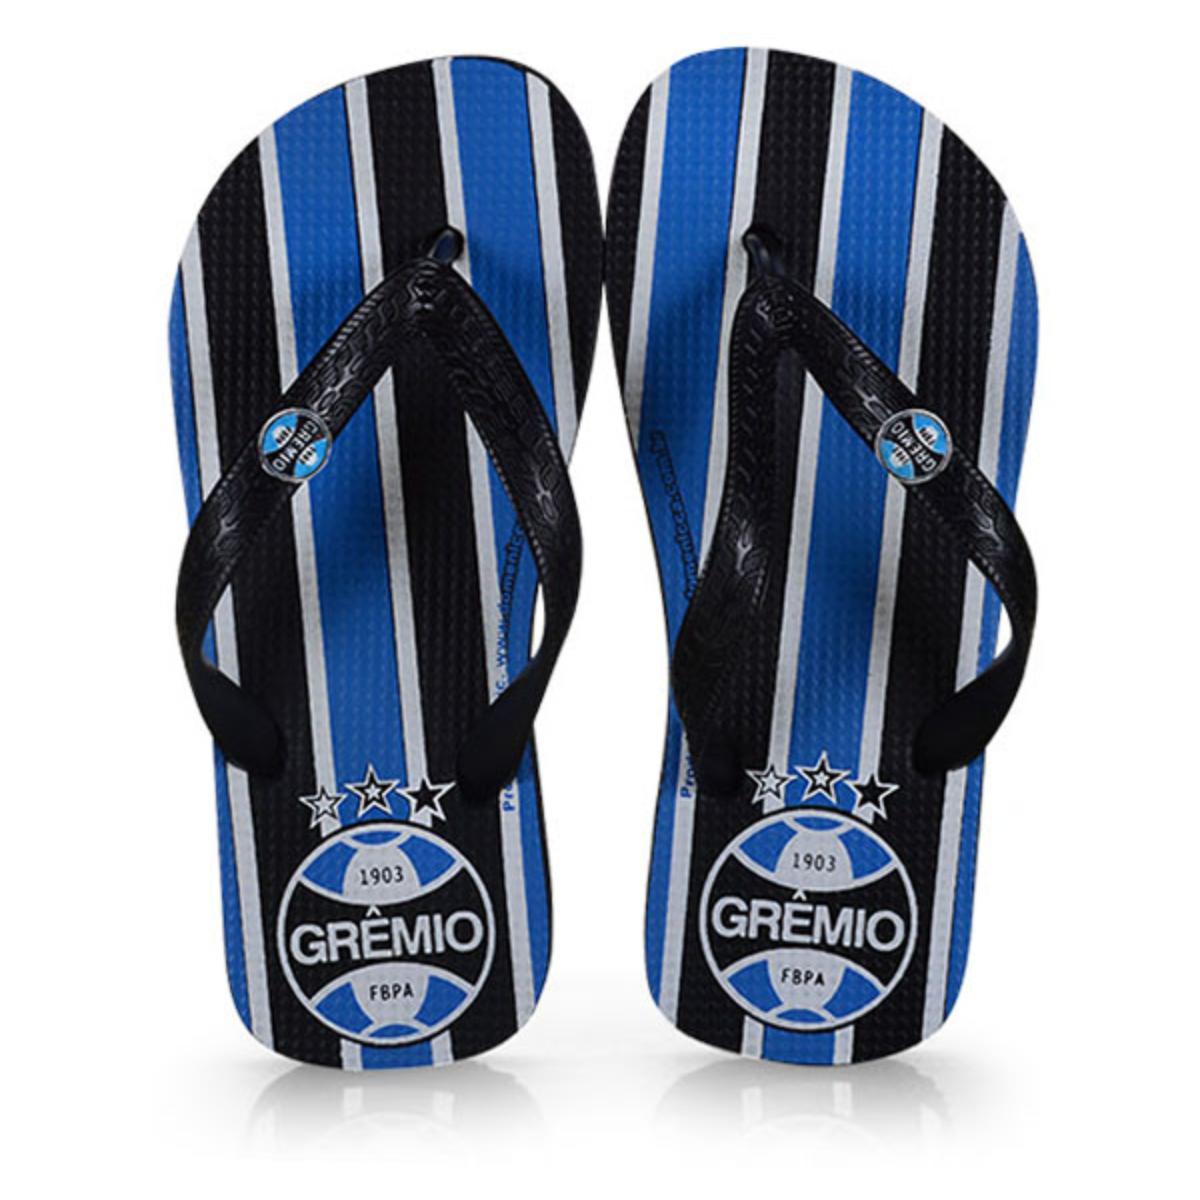 Chinelo Uni Infantil Dilva Oldoni 120258 Grêmio Preto/azul